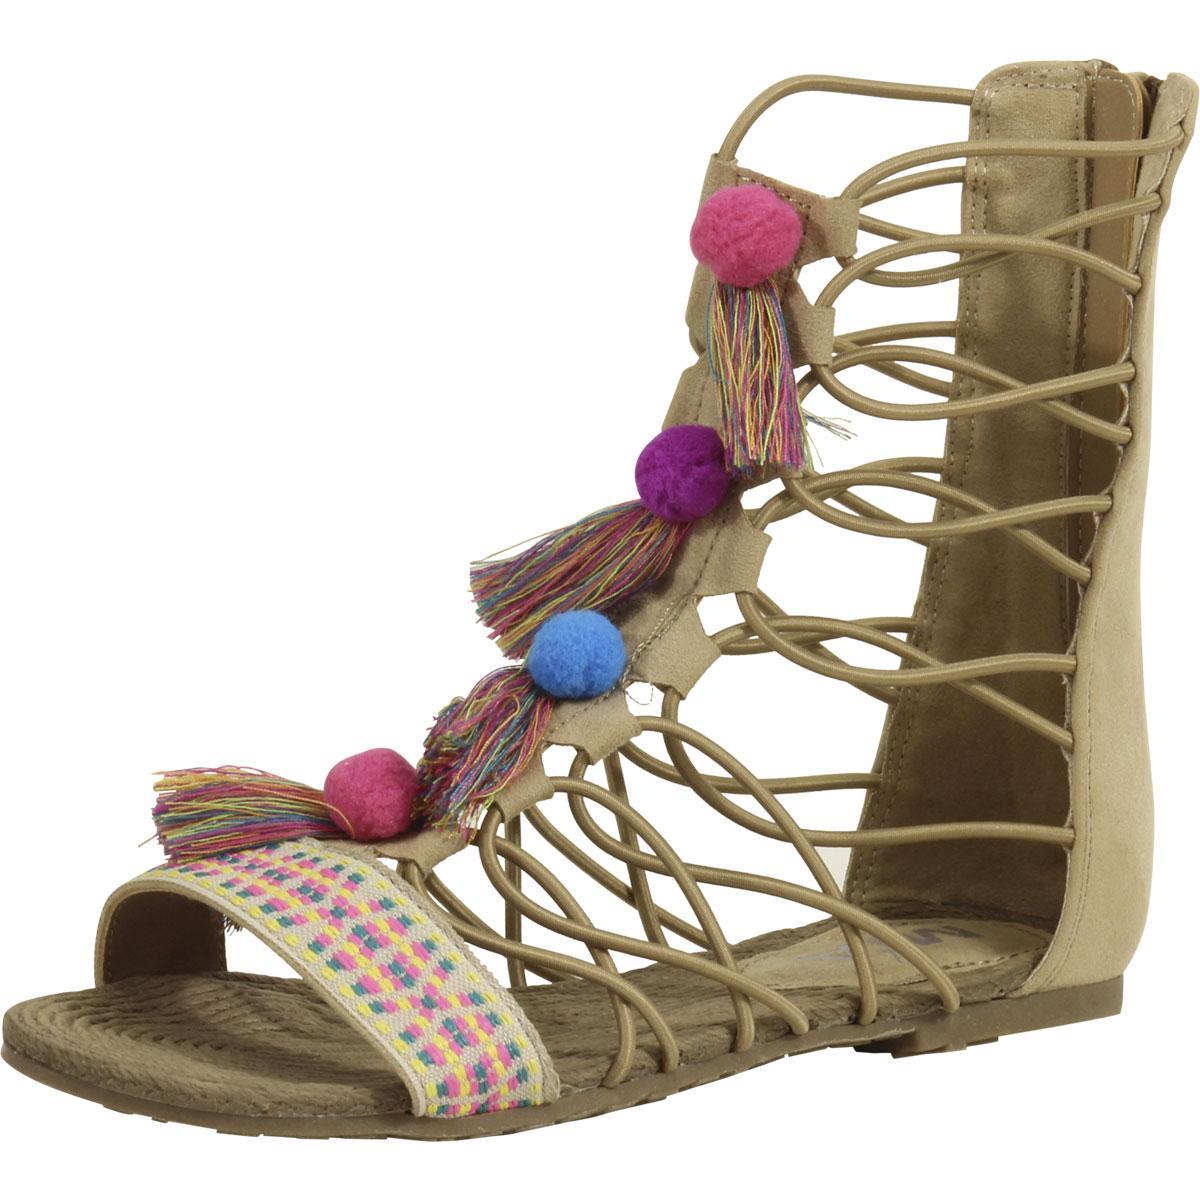 a2f08cdc202 Mia Kids Little Big Girl s Jordy Gladiator Sandals Shoes